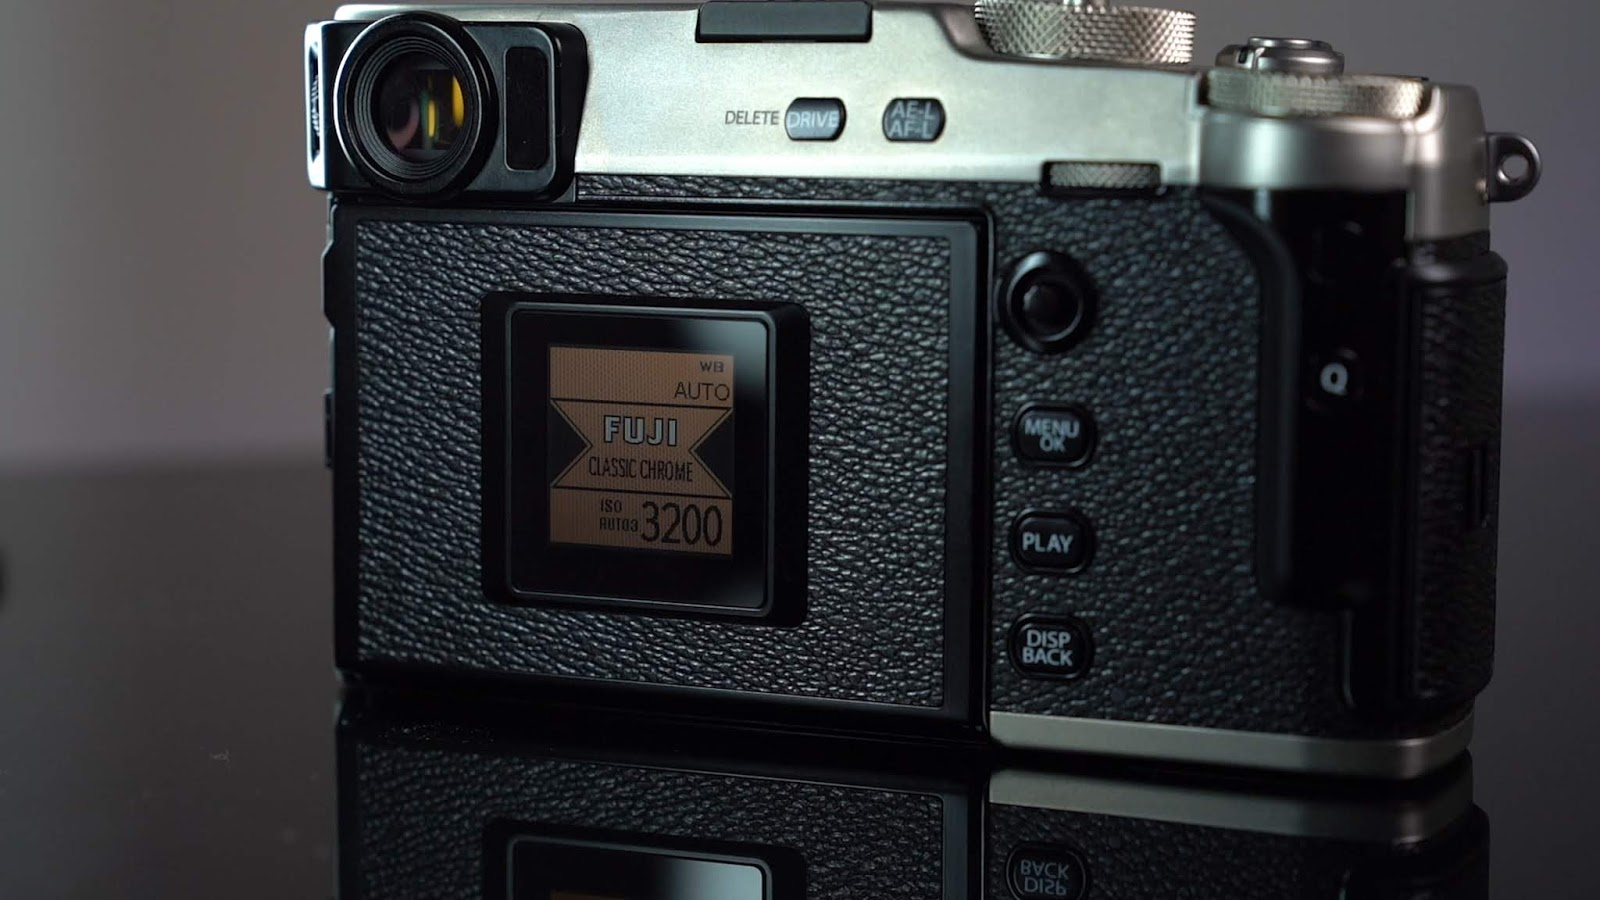 Rear Screen of the Fujifilm X-pro 3